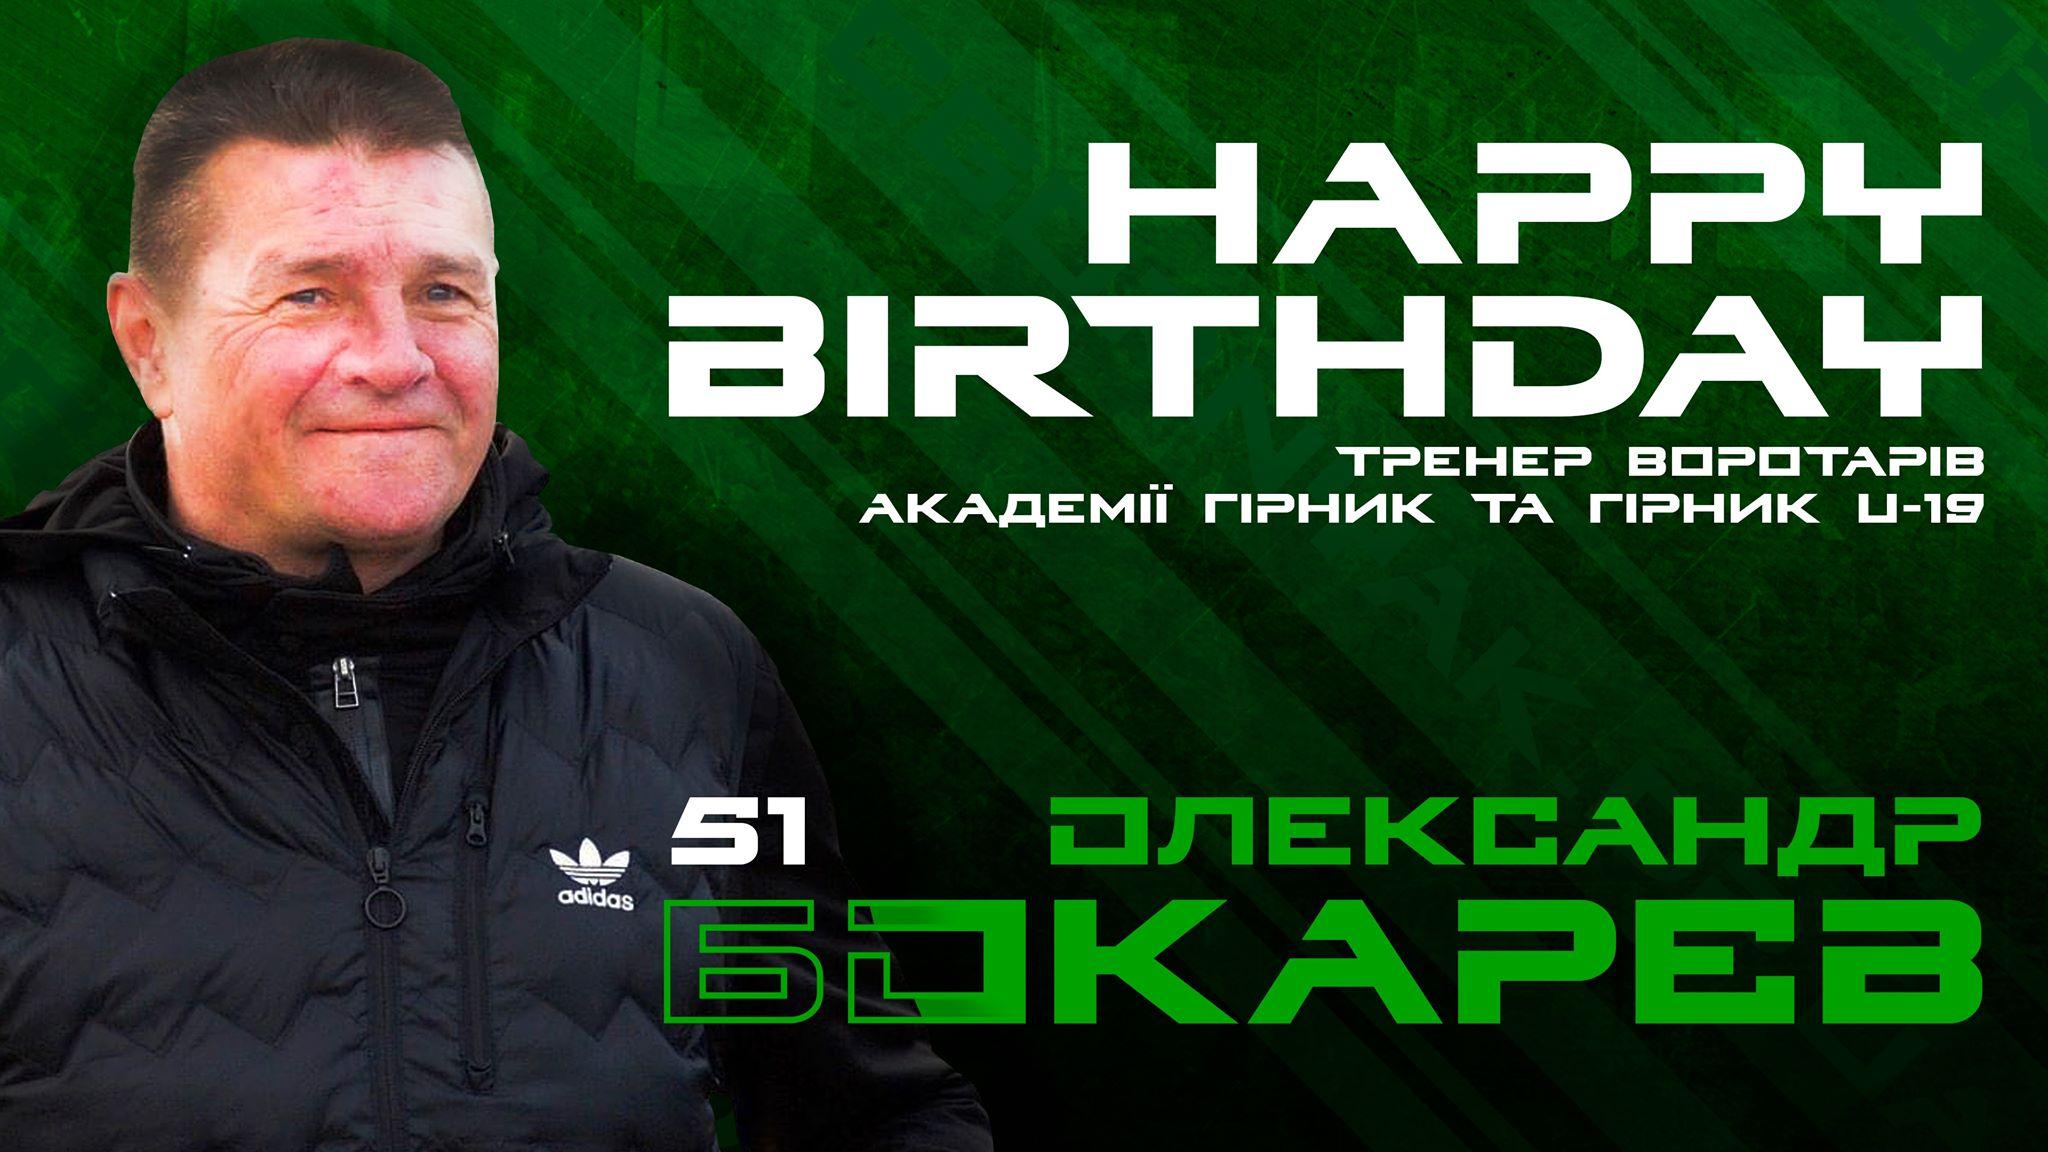 Александру Бокареву - 51!